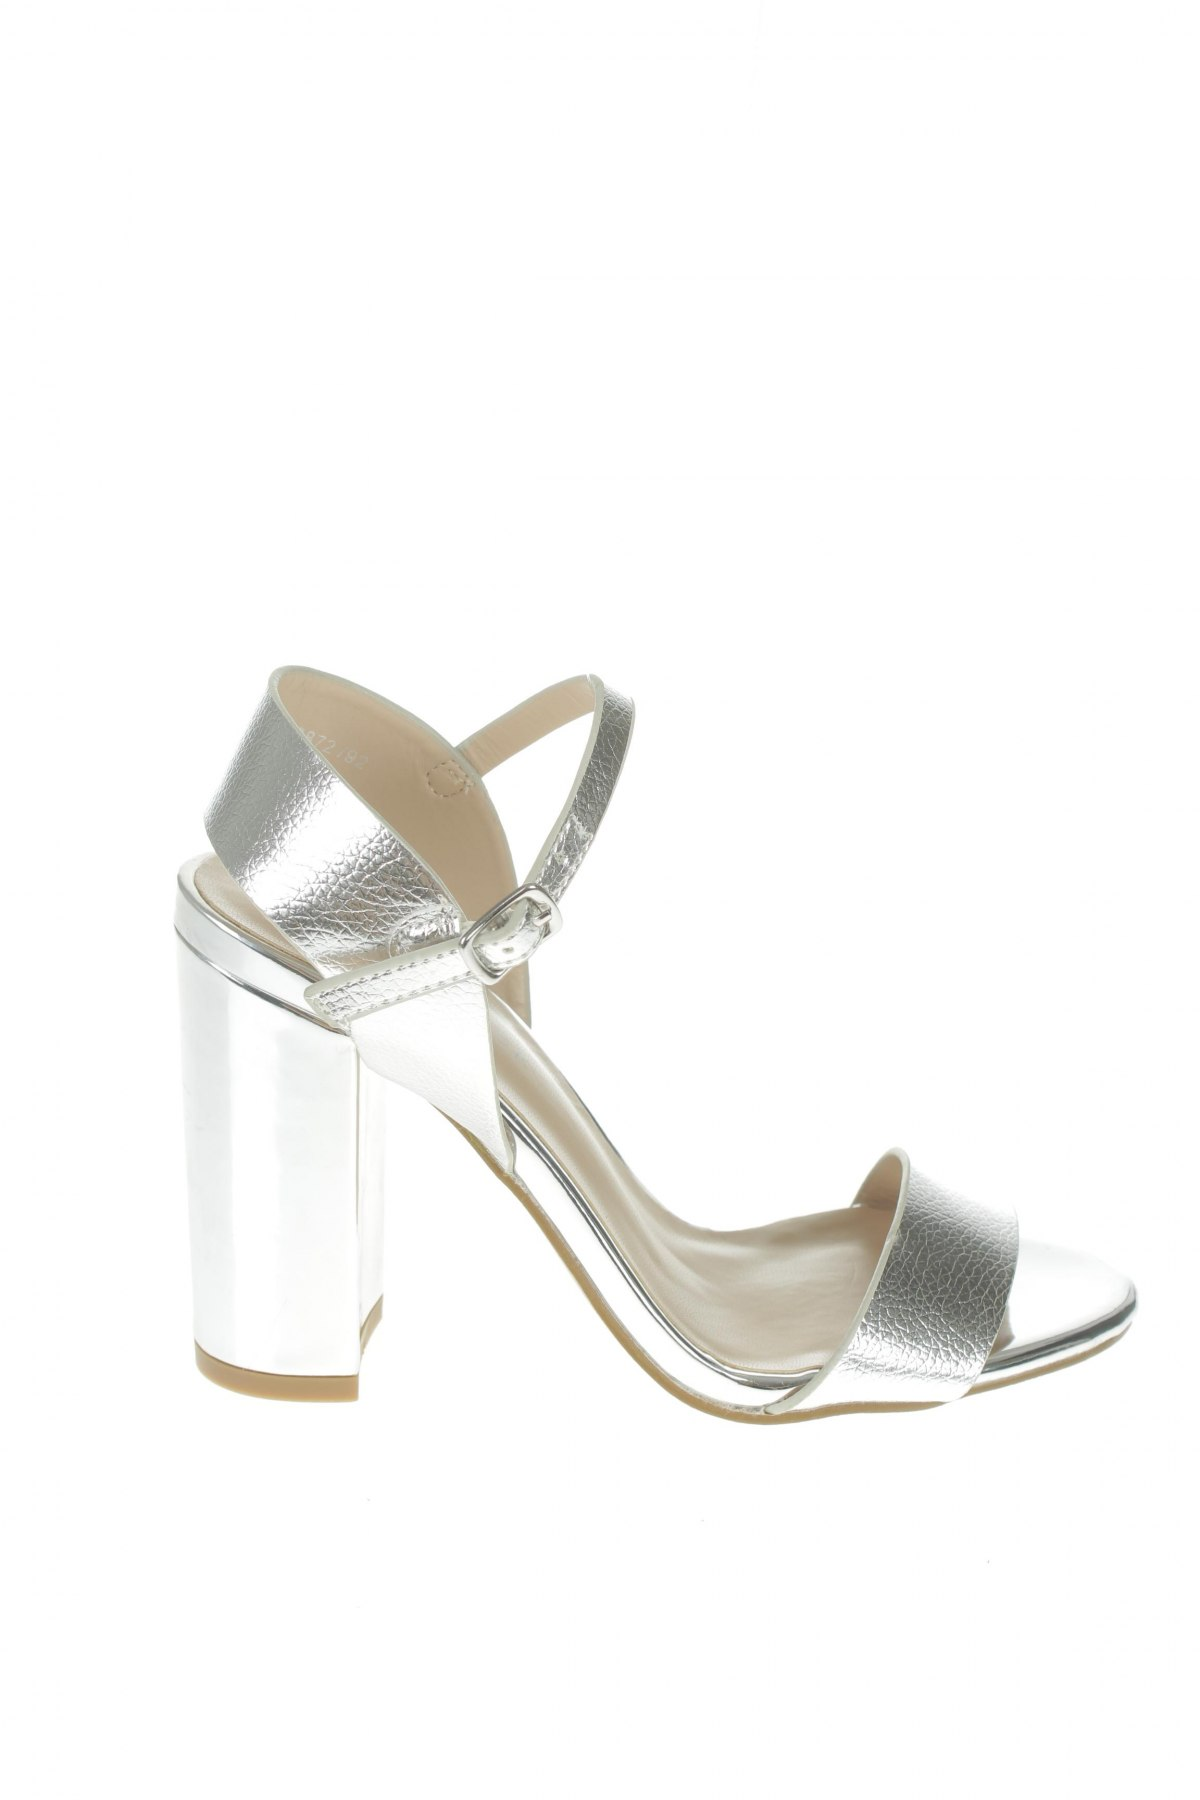 12175080c555 Sandale New Look - la preț avantajos pe Remix -  100714155